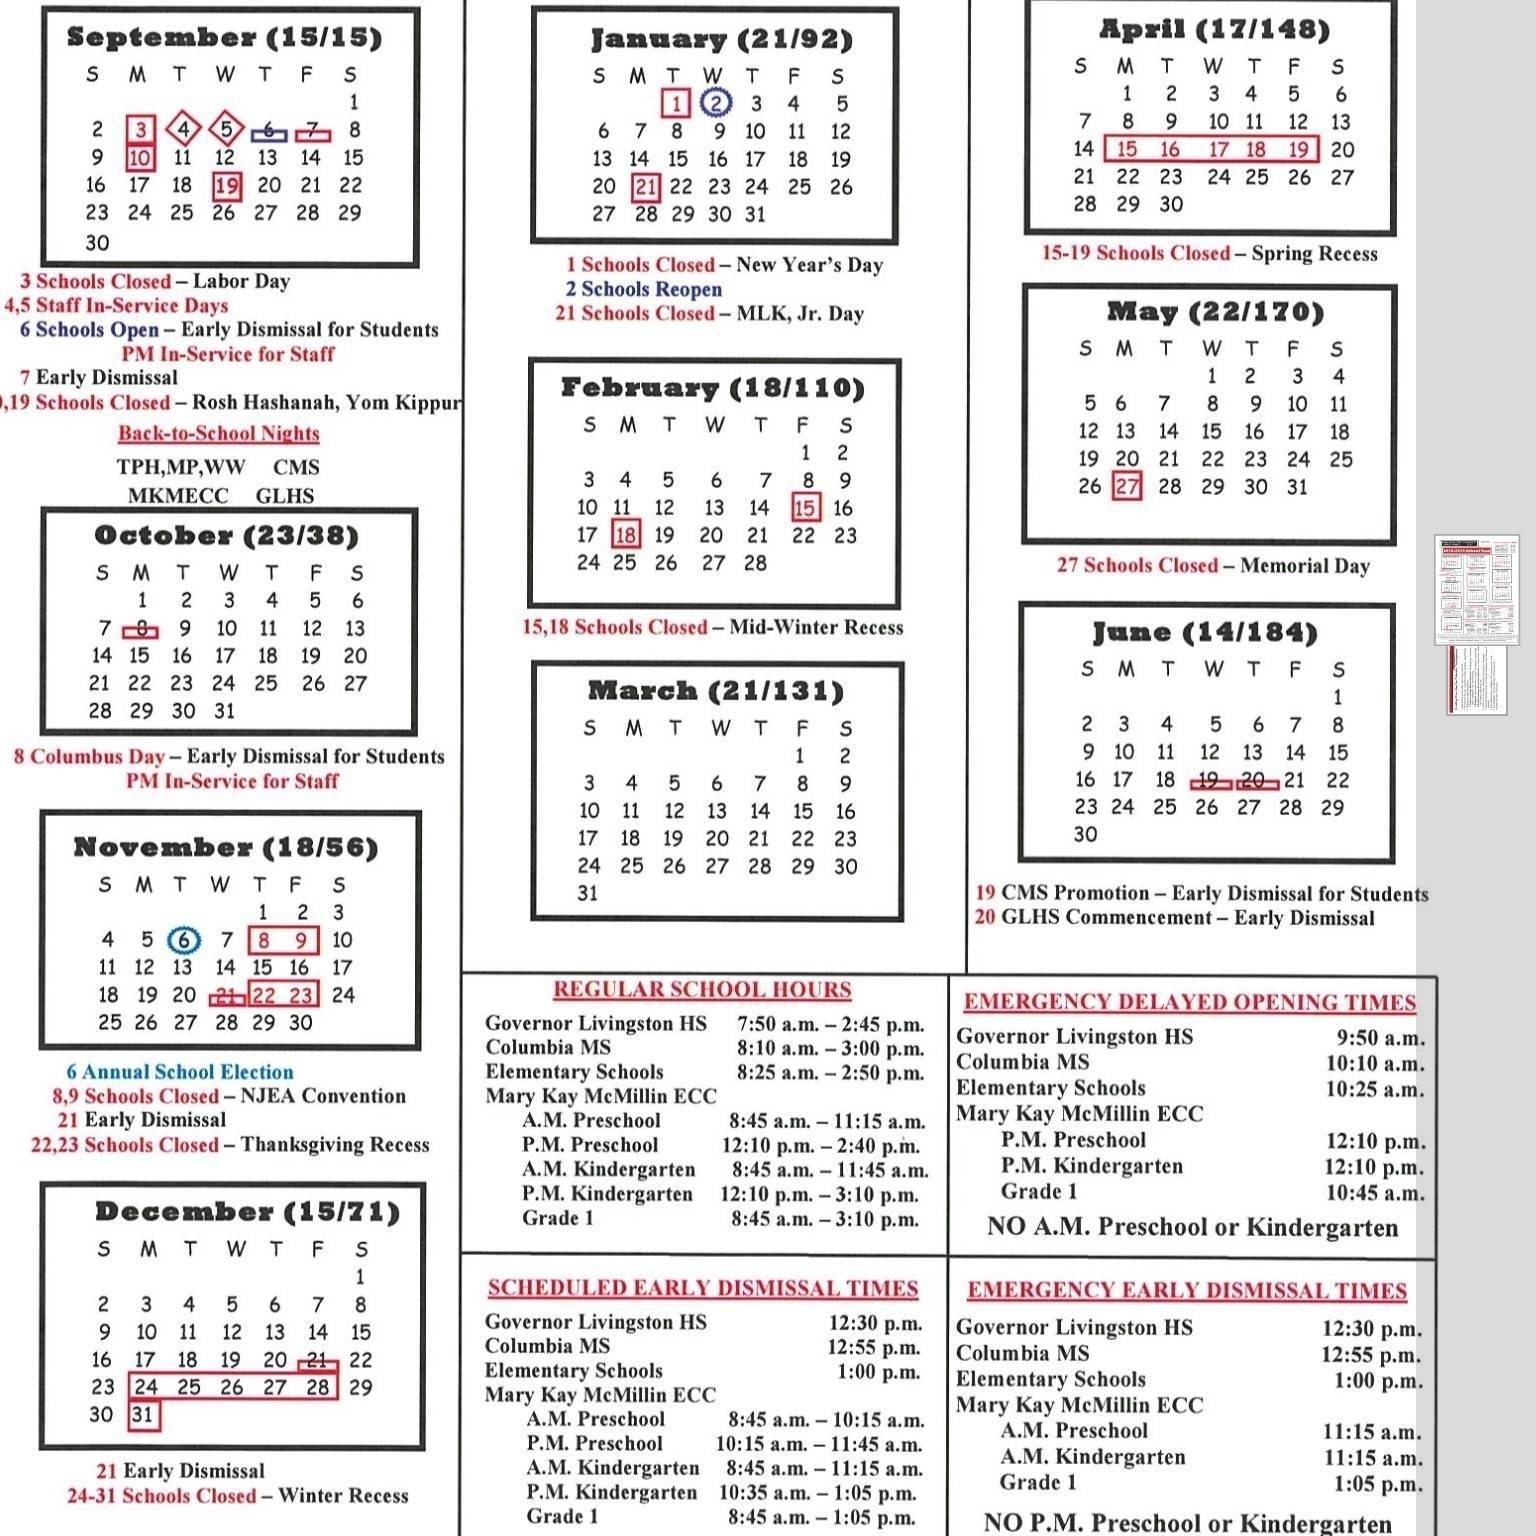 Berkeley Academic Calender 2019-2020 - Calendar Inspiration within Uc Berkeley School Calendar 2019 2020